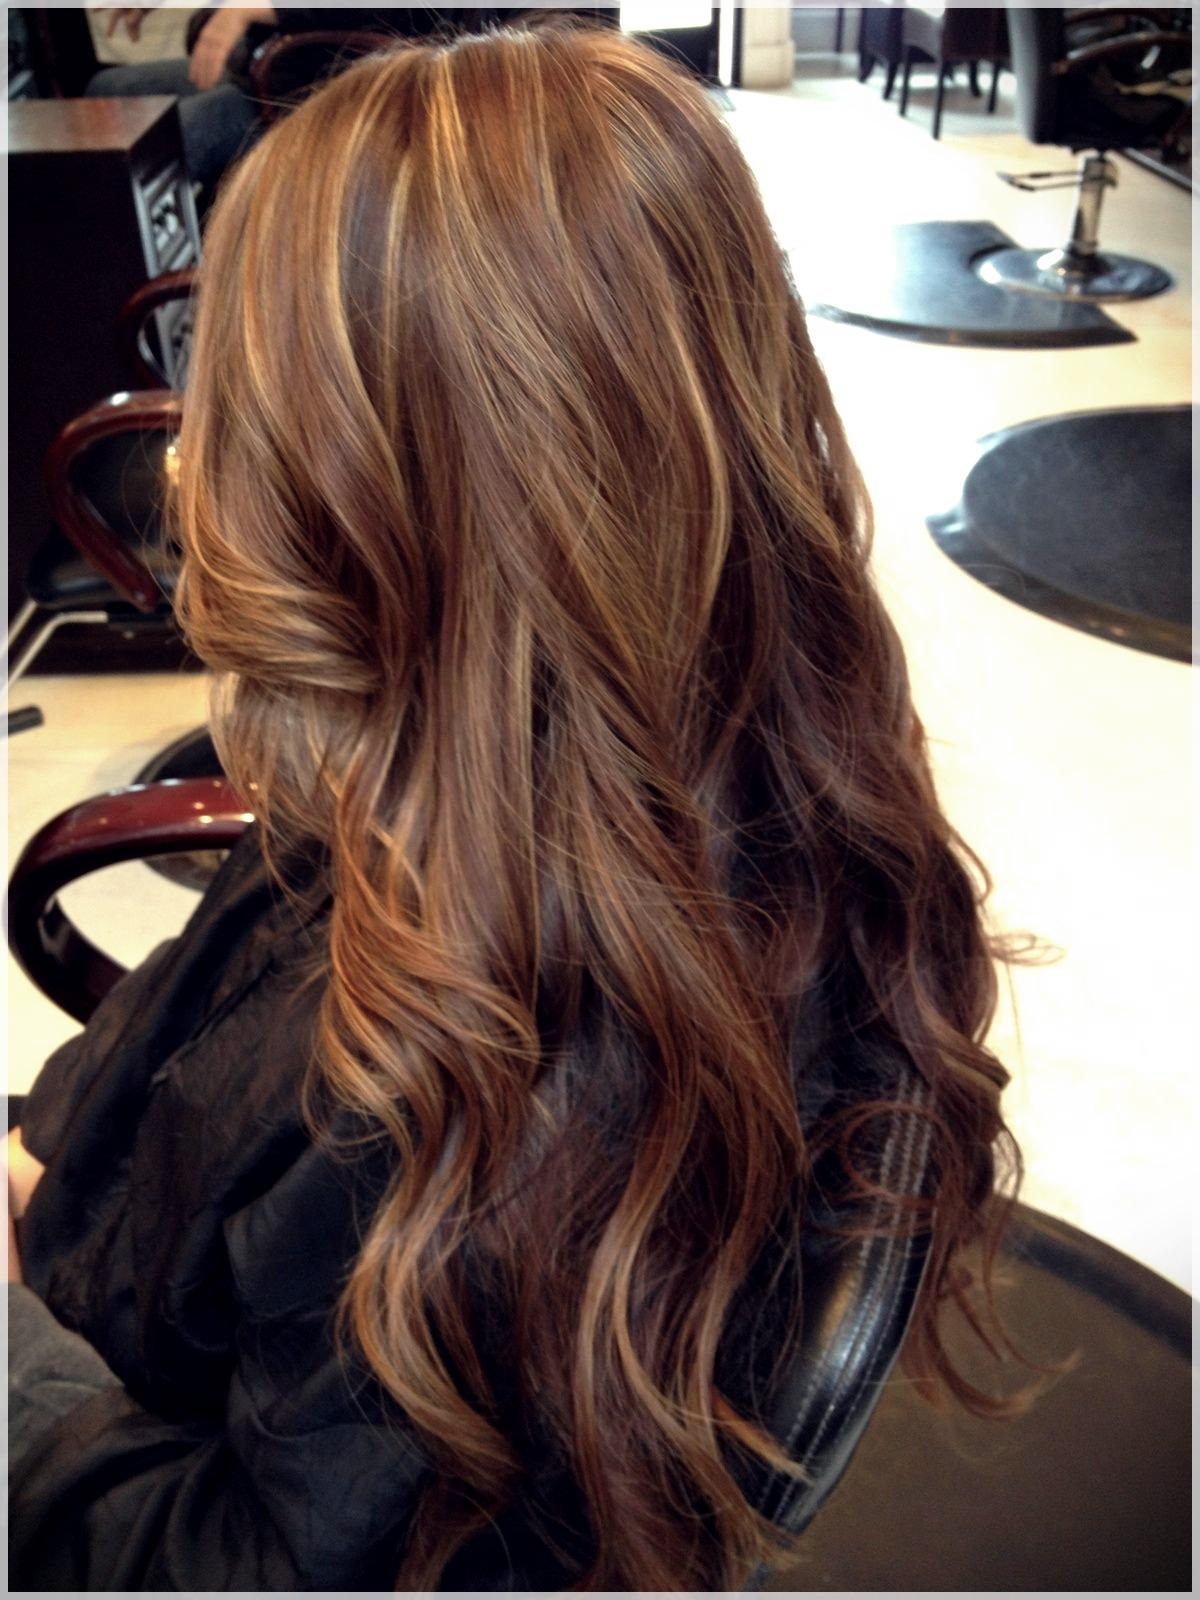 caramel brown hair color ideas 8 - Rocking caramel brown hair color